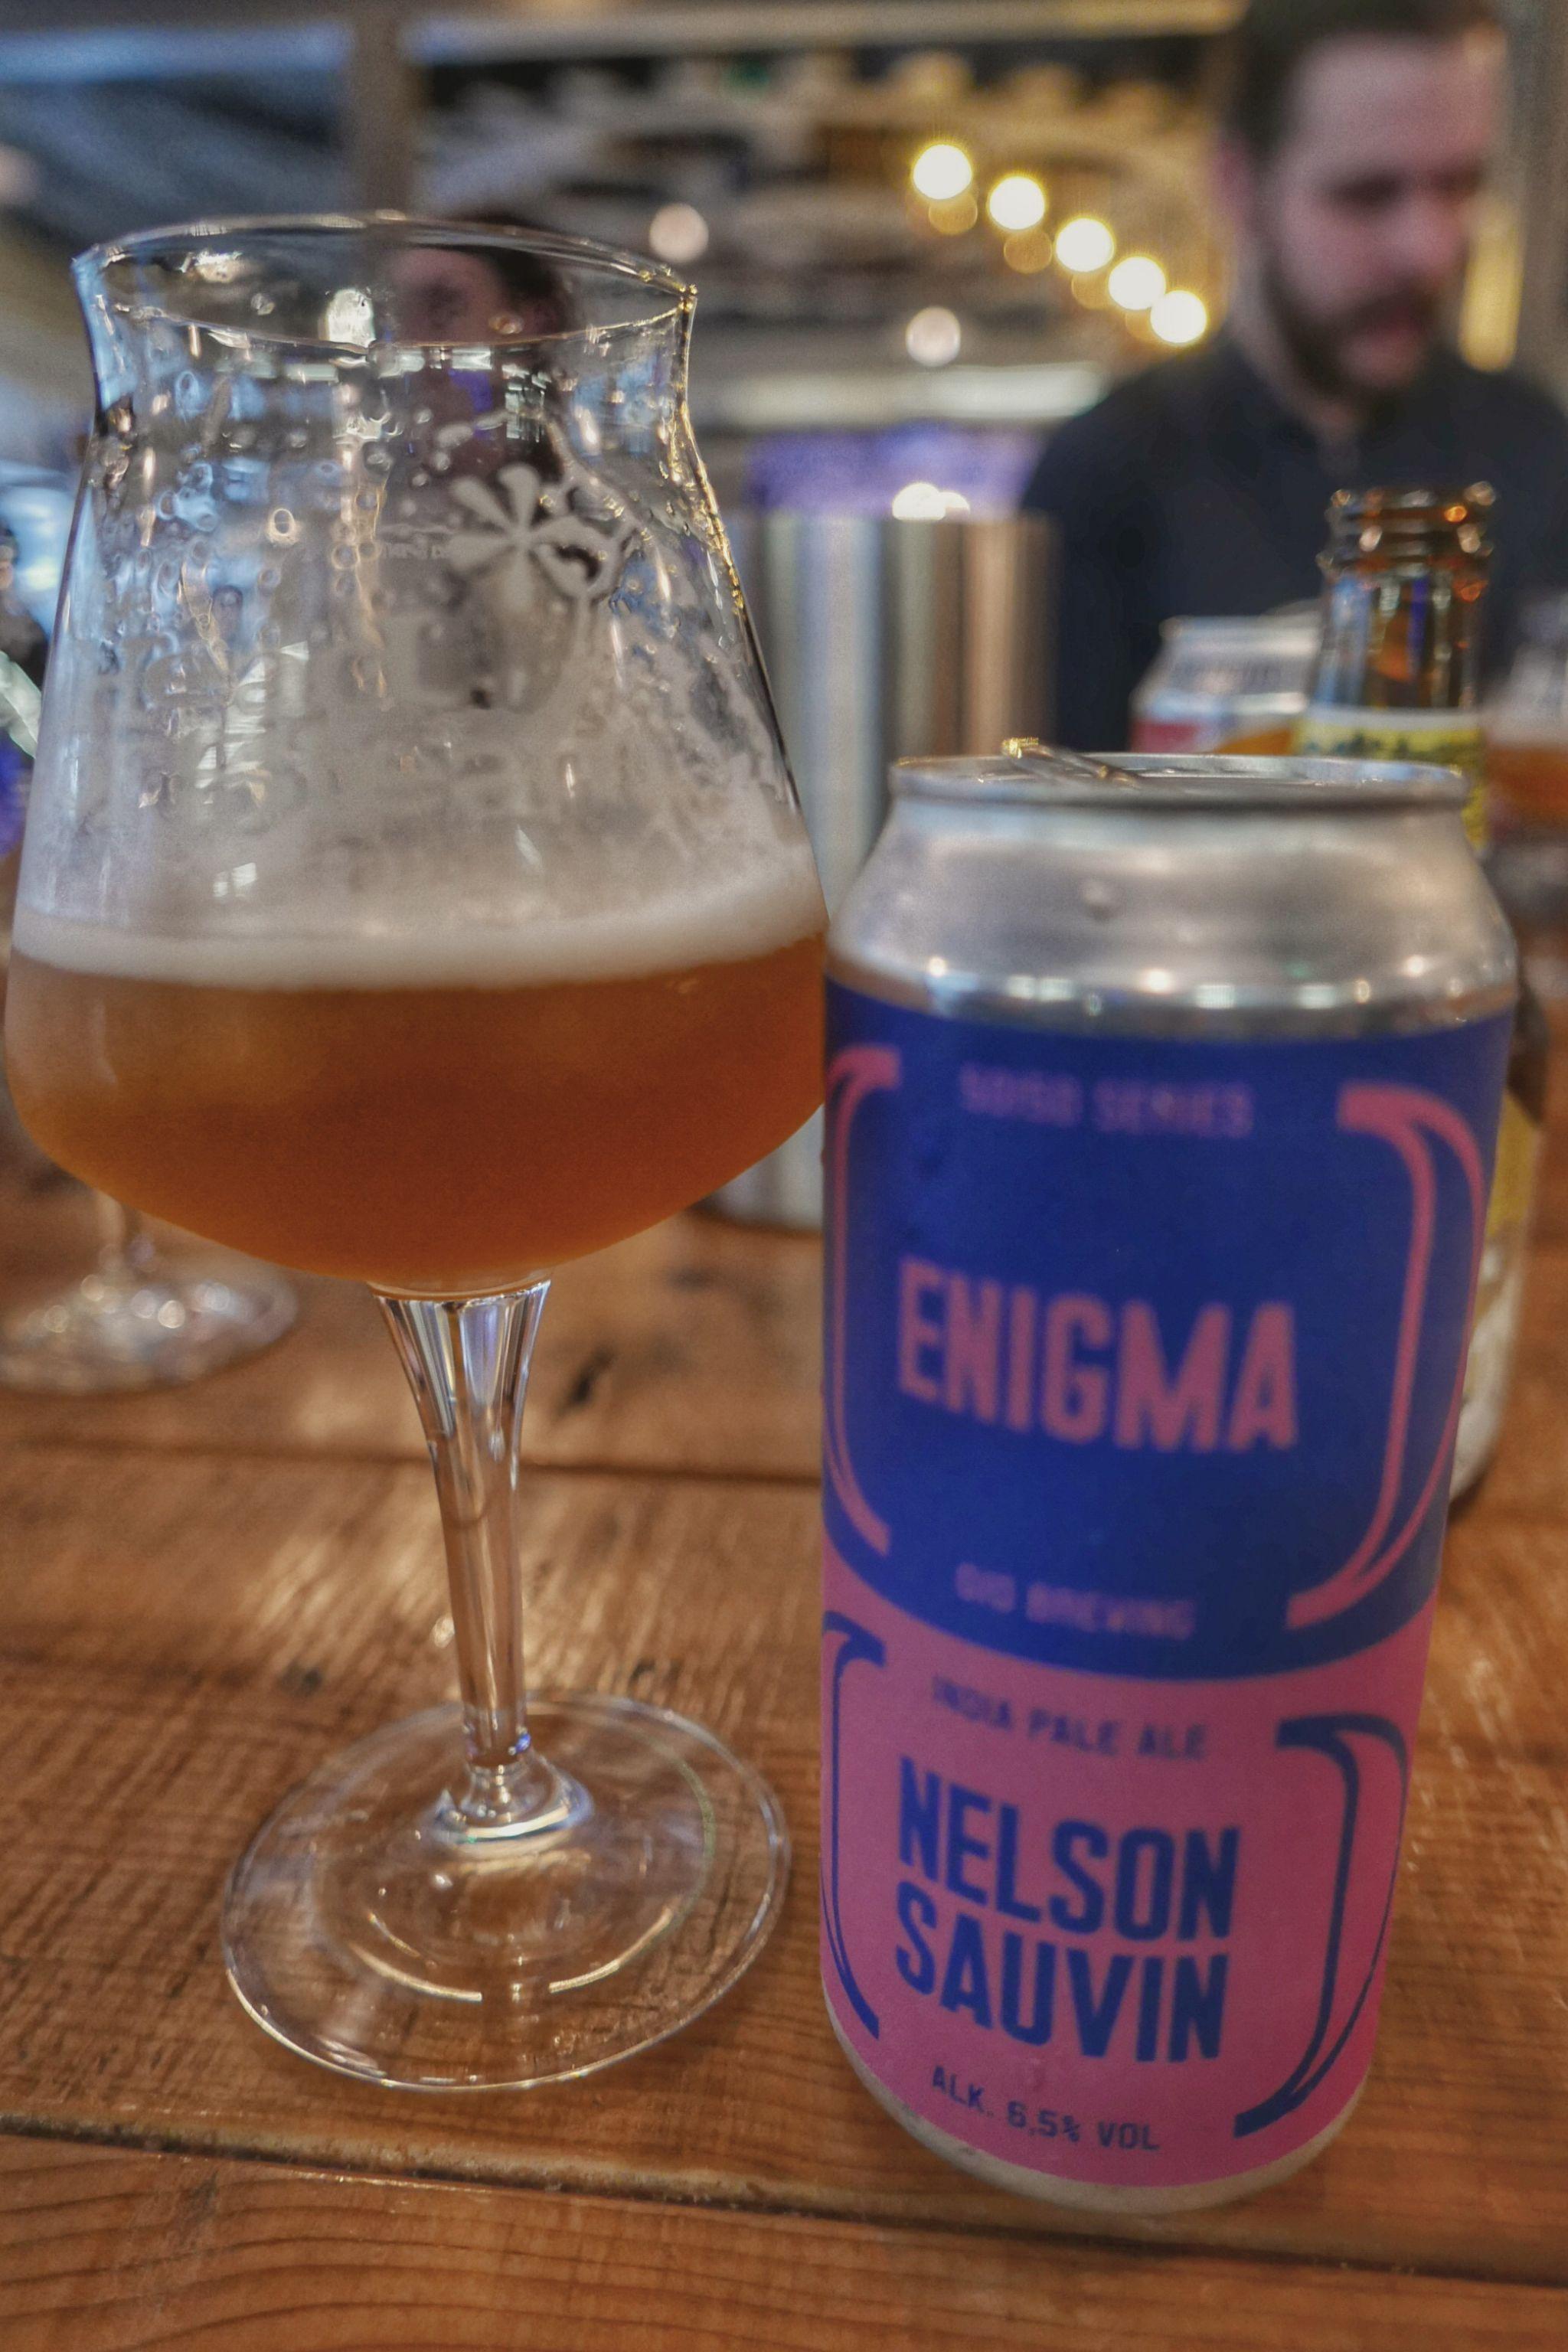 00 Brewing's Enigma/Nelson Sauvin